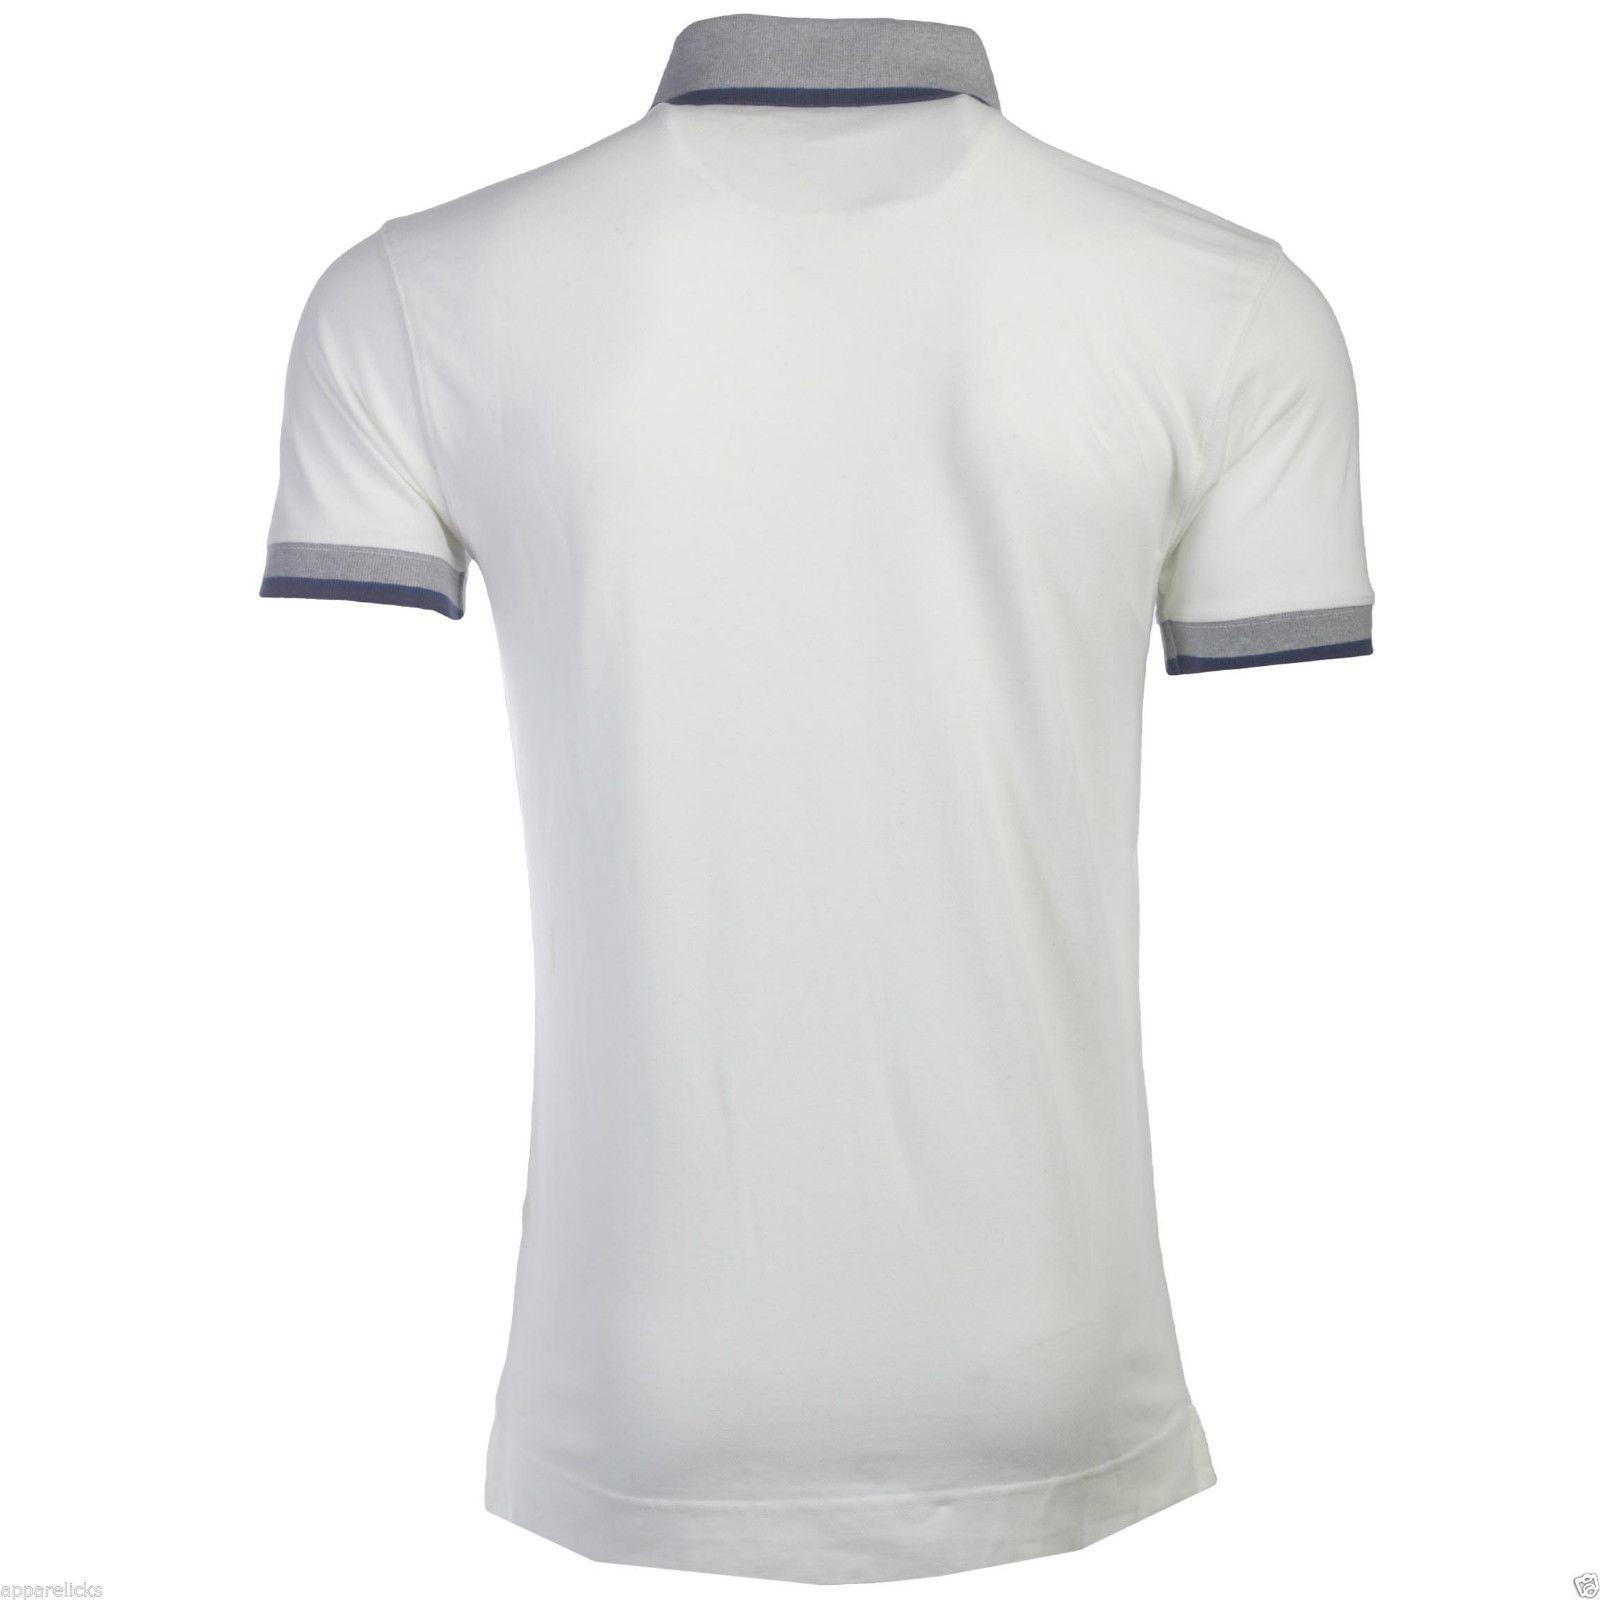 Gas mens button down short sleeves casual shirts top shirt for Mens short sleeve button down casual shirts